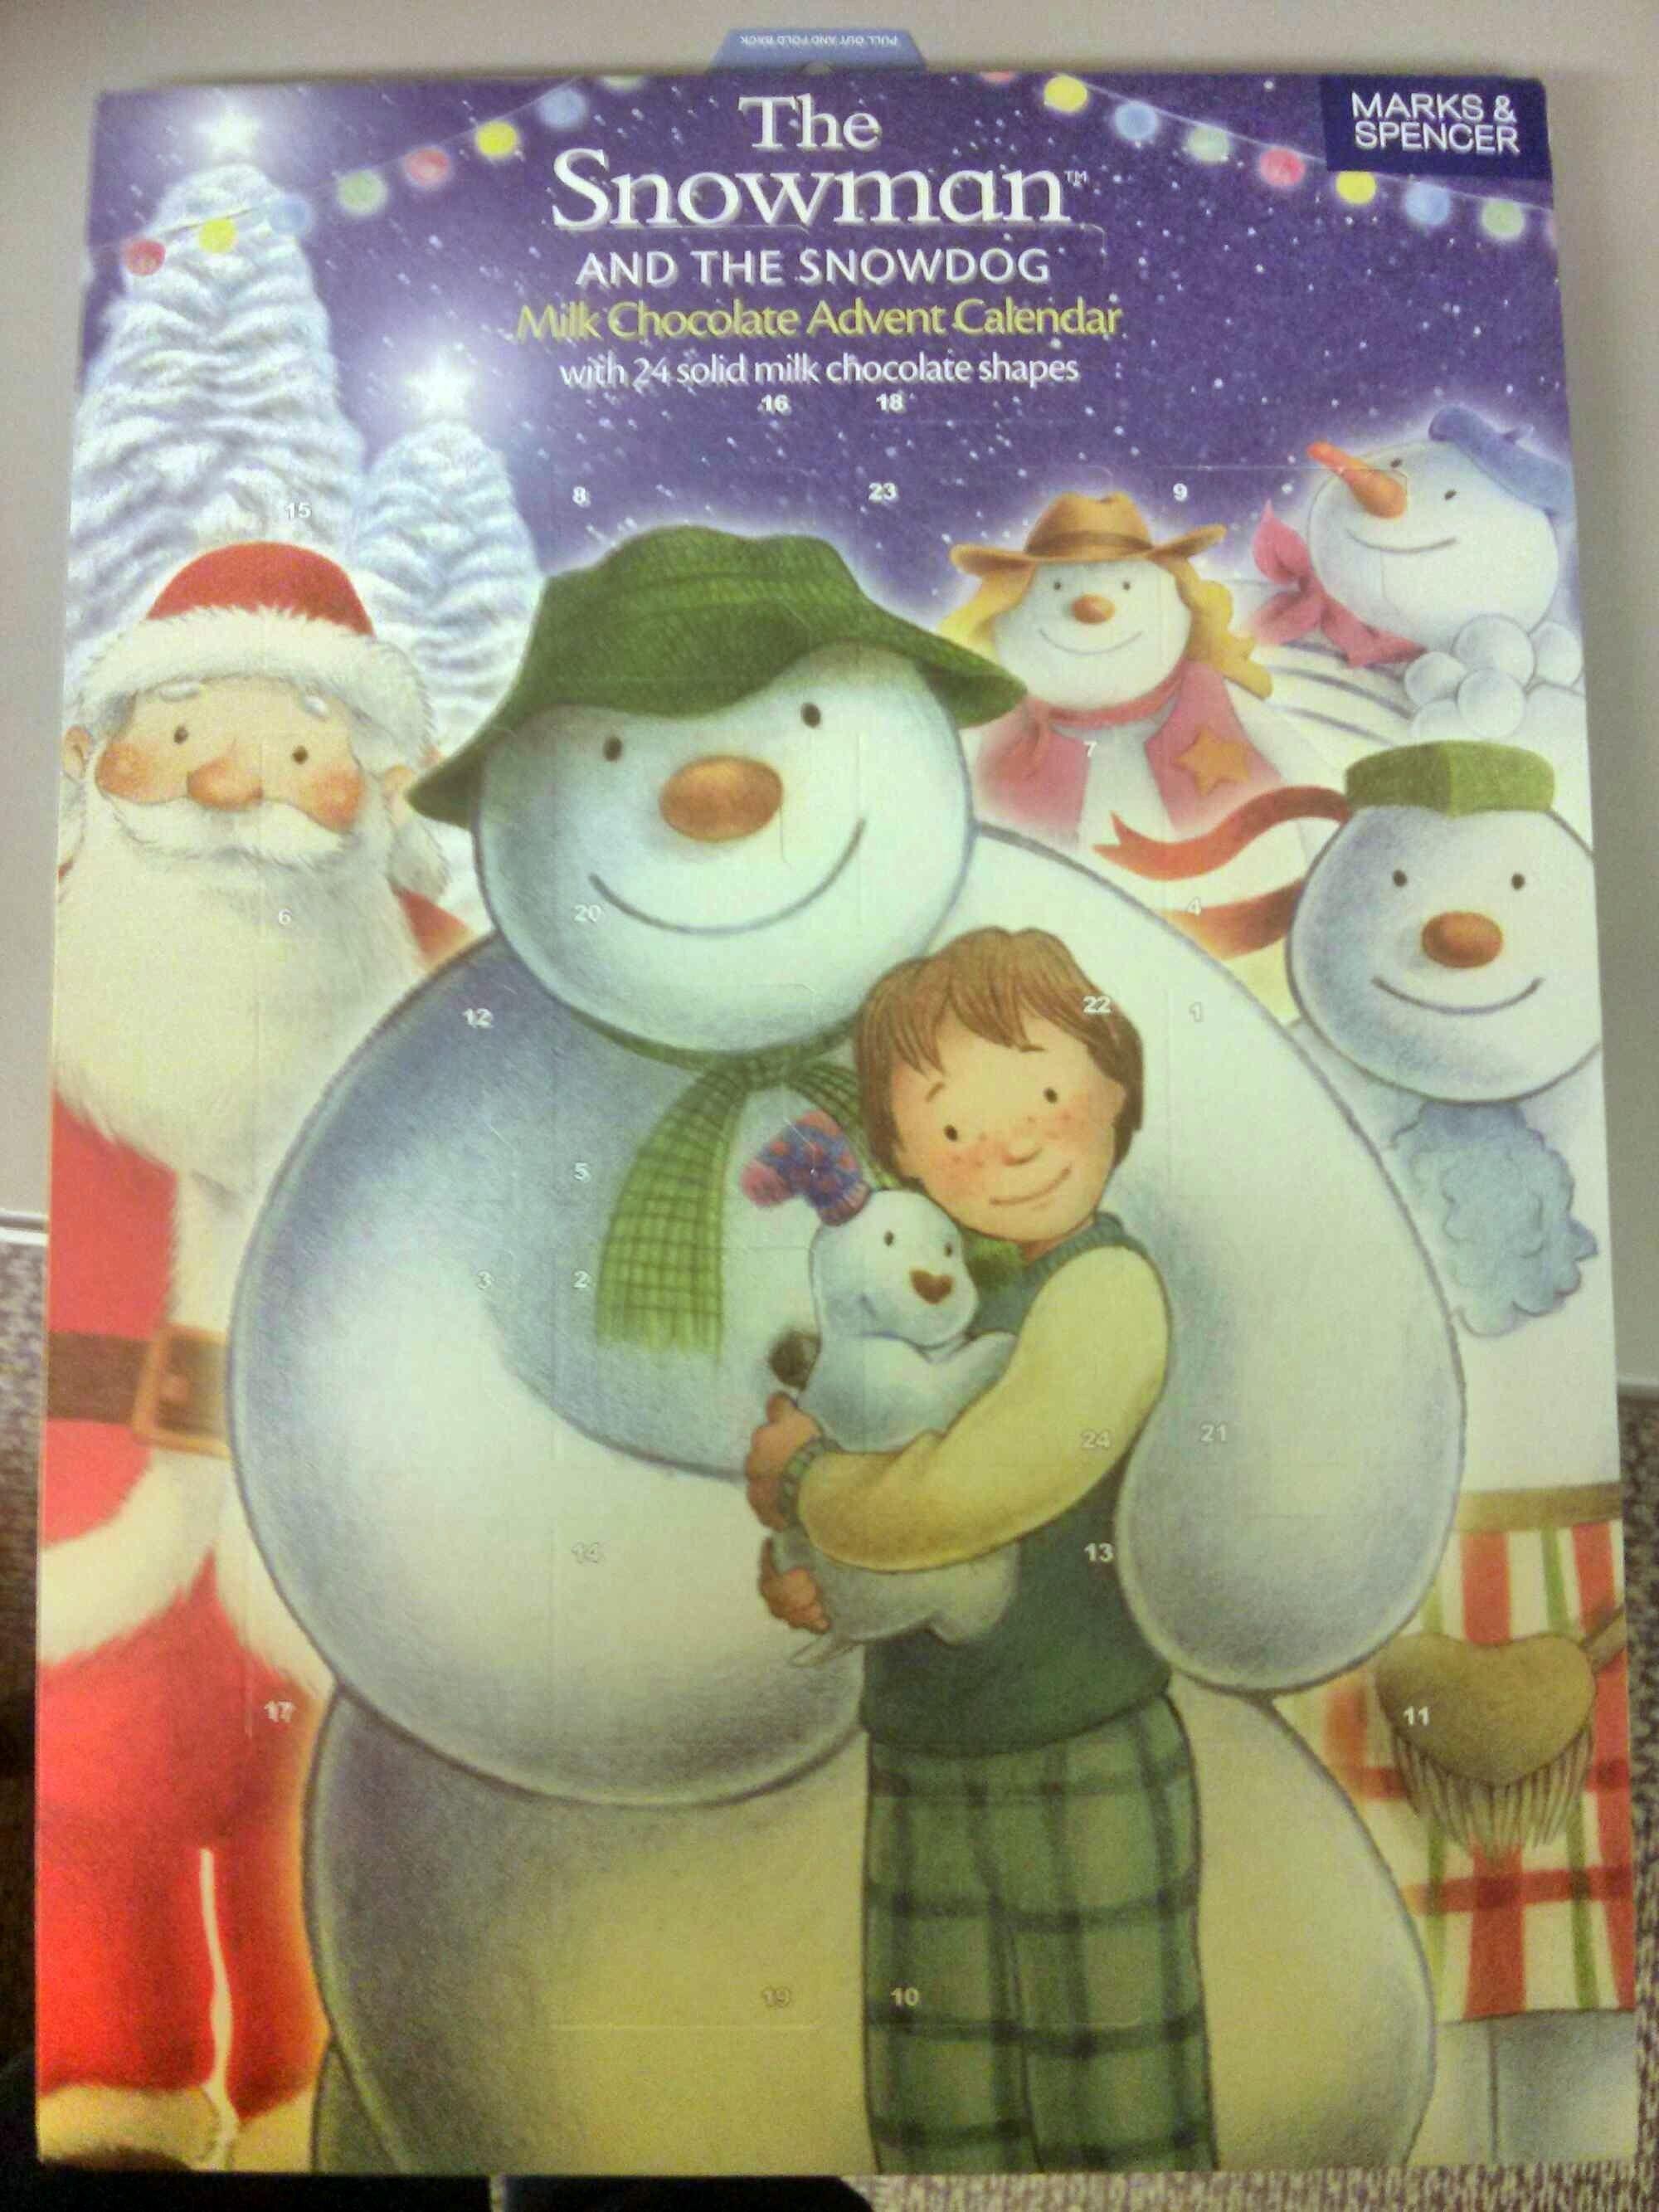 The Snowman & The Snowdog Milk Chocolate Advent Calendar - Product